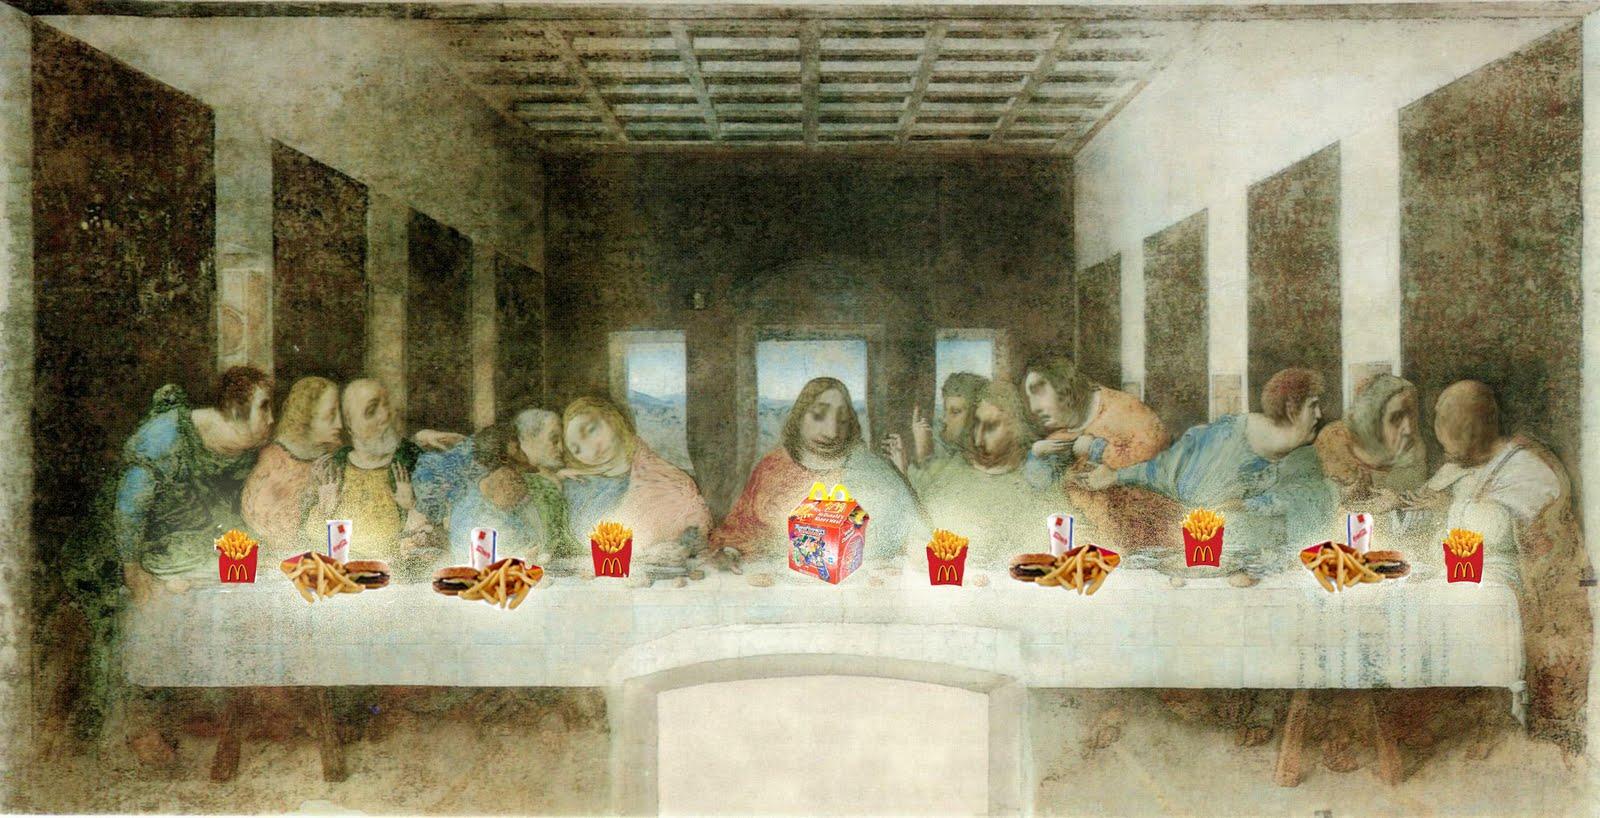 Leonardo Da Vinci The Last Supper Secrets Revealed - Viewing Gallery Da Vinci Paintings Secrets